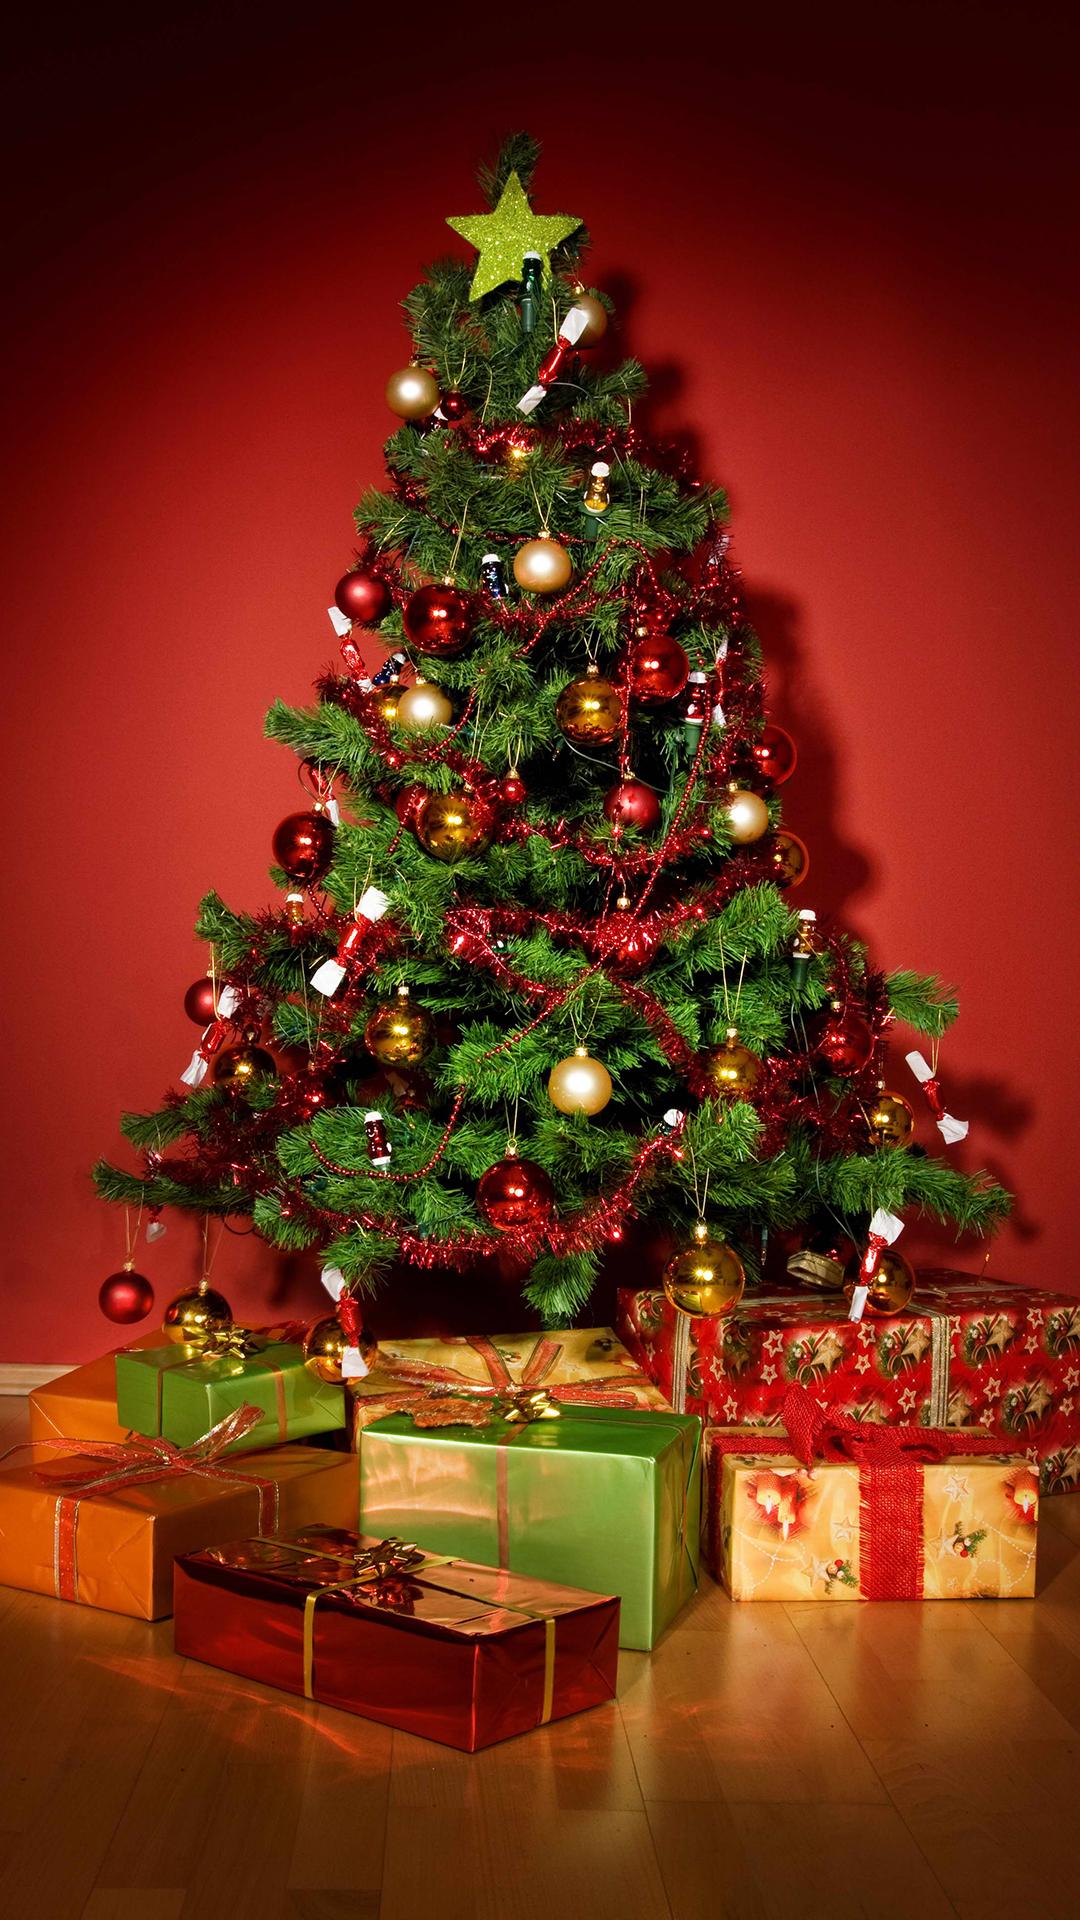 Christmas Tree htc one wallpaper